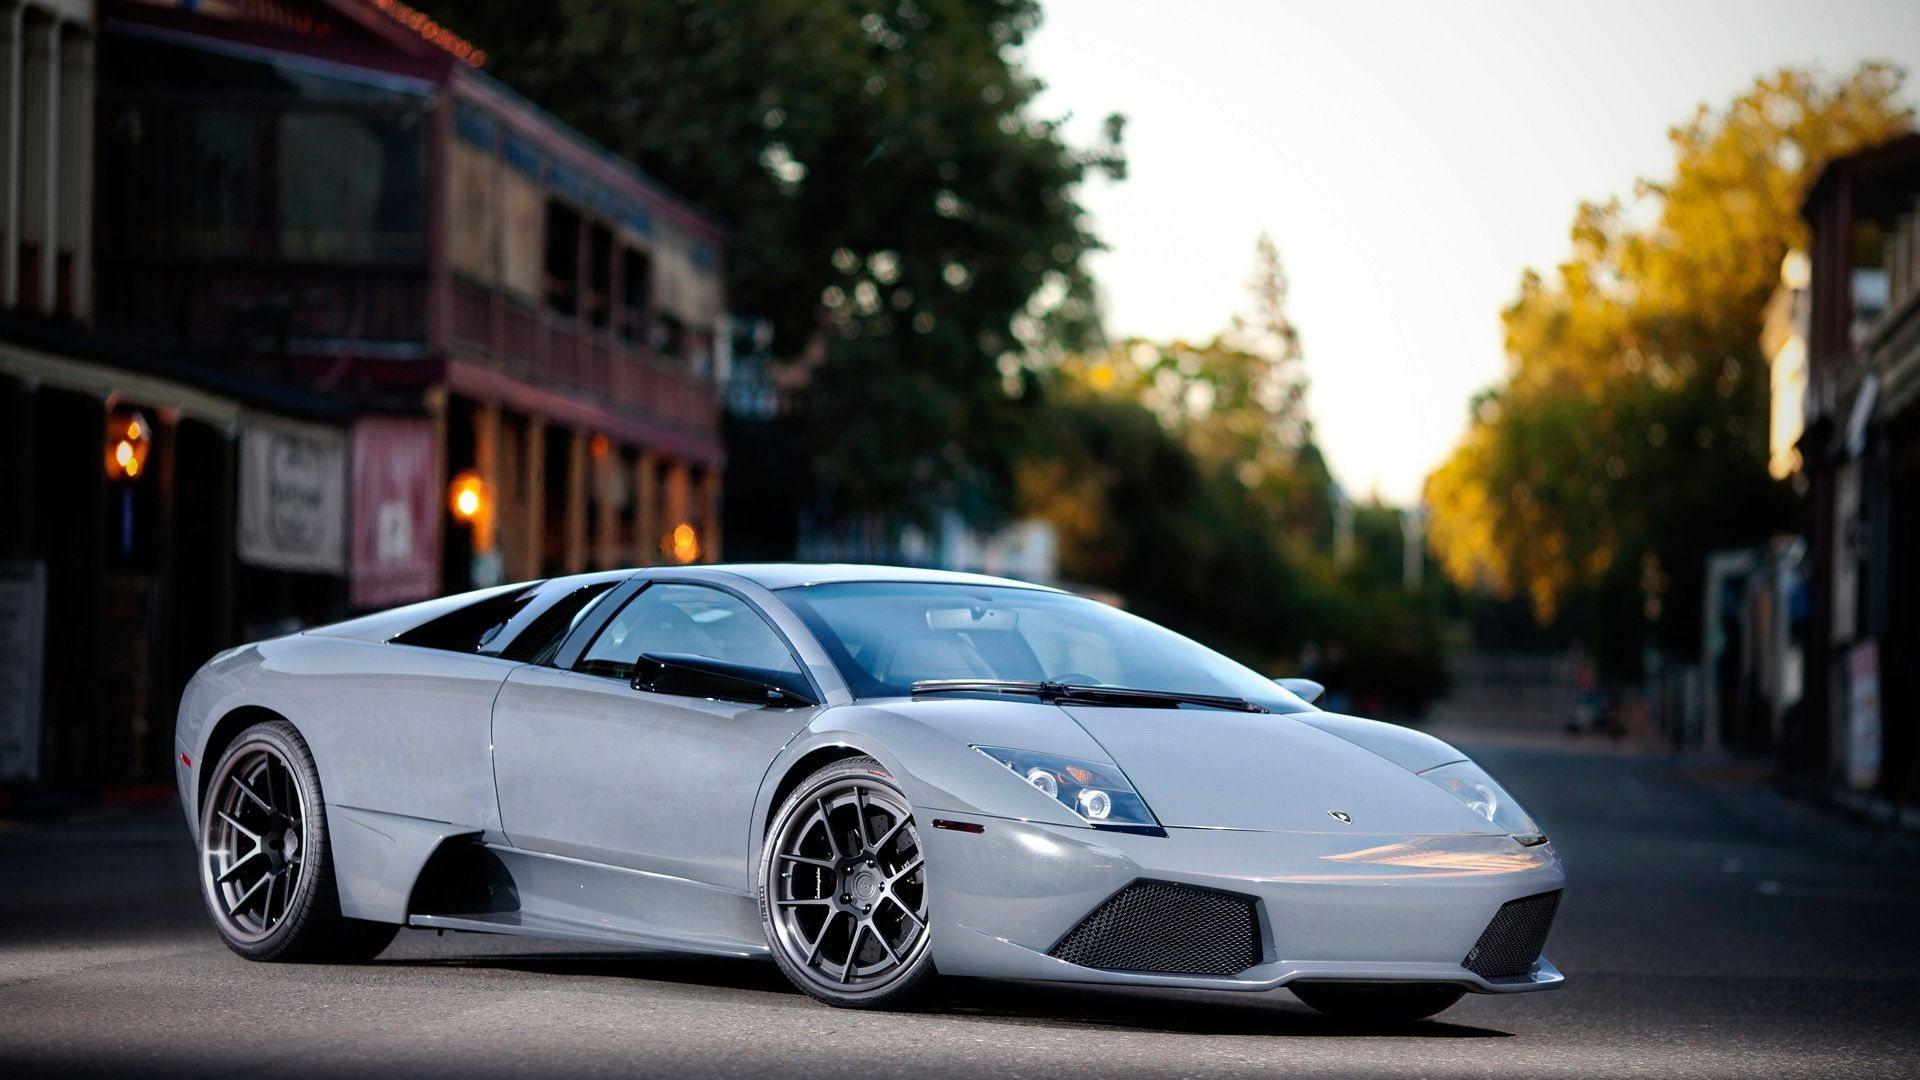 Lamborghini desktop background full hd supercar 1920x1080